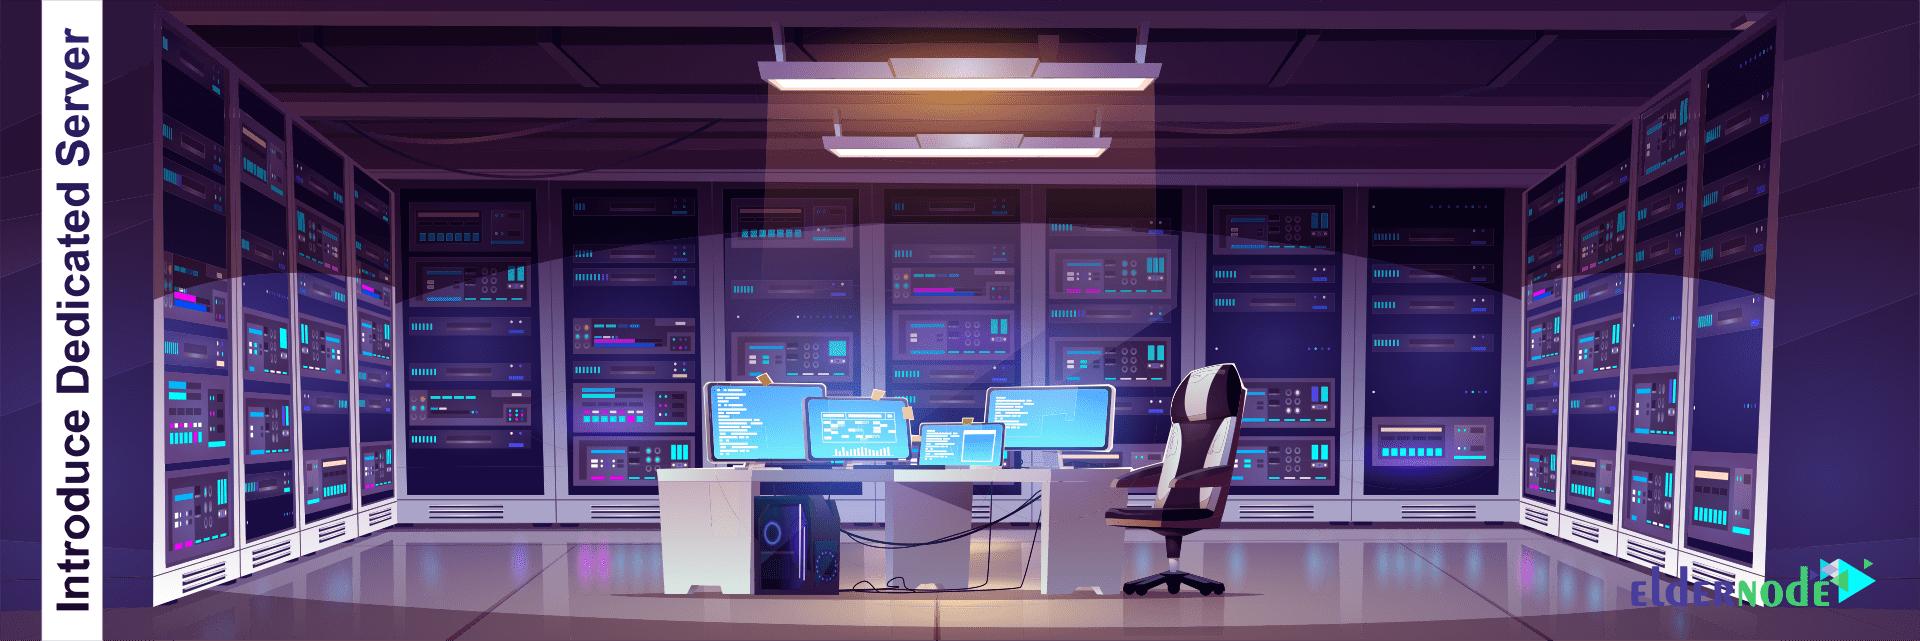 introduce dedicated server ElderNode